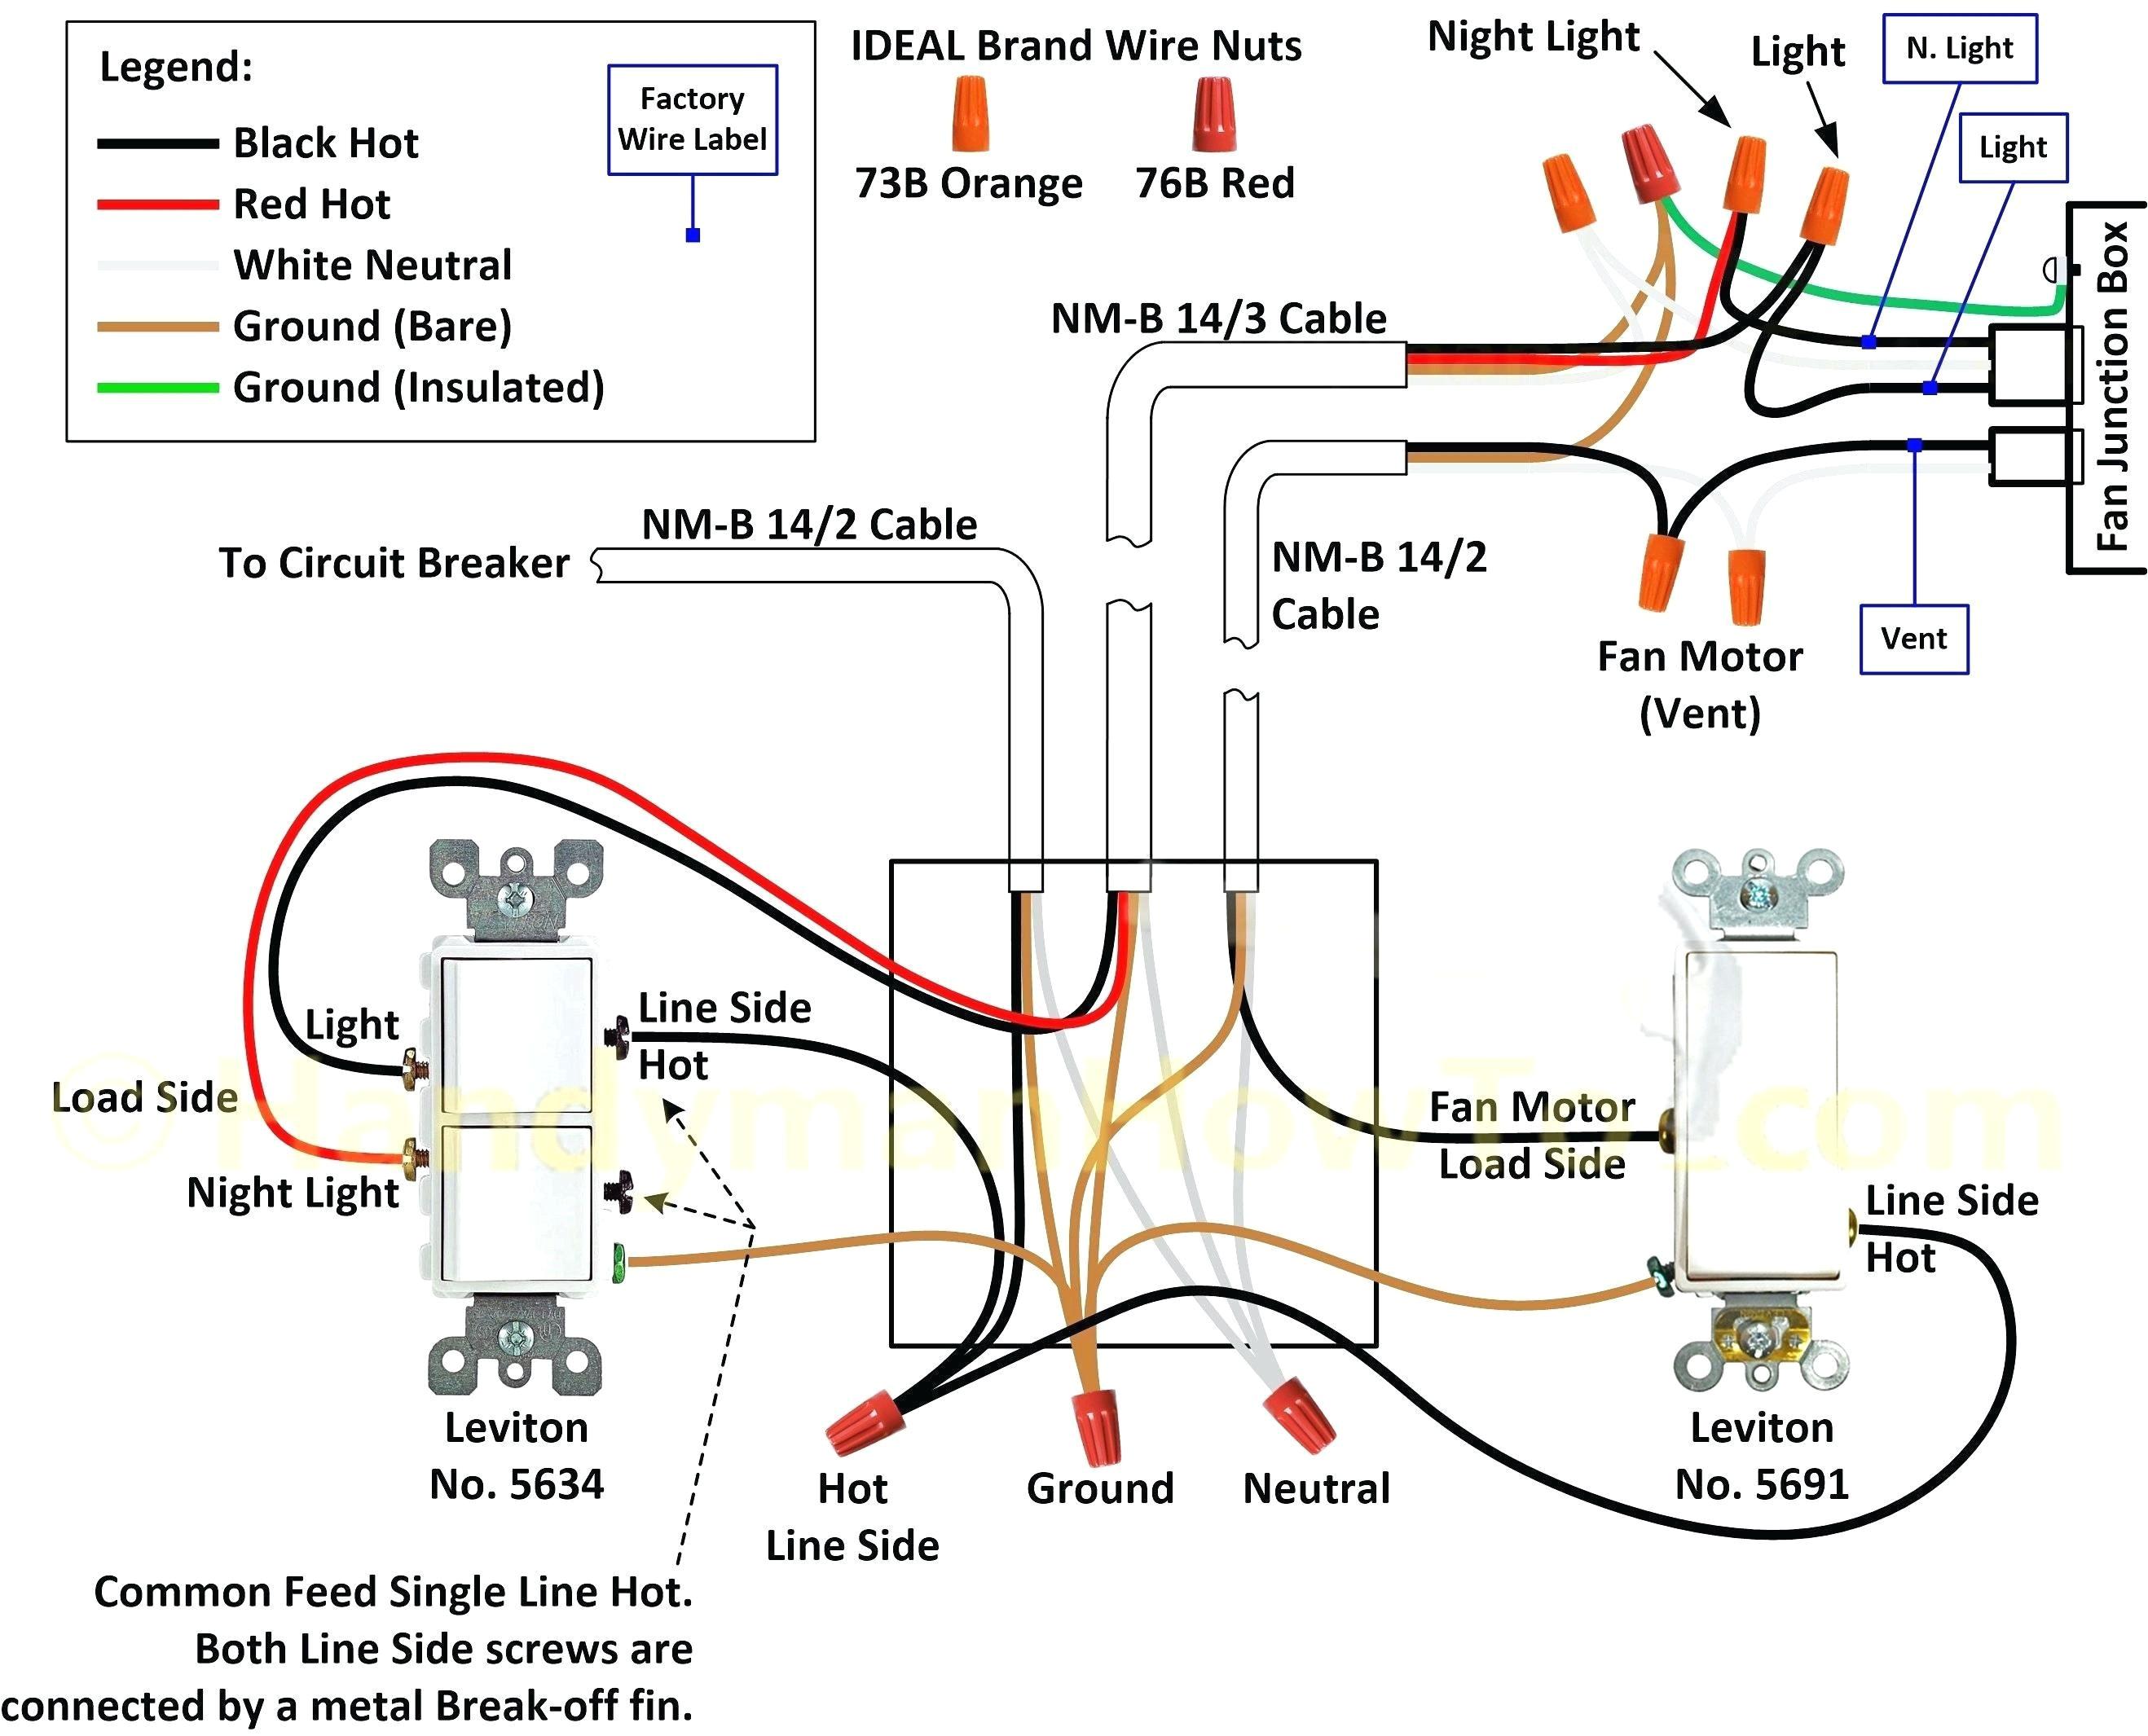 gfci wiring diagram 110v wiring diagram technic mix 110v gfci schematic wiring diagram wiring diagramgfci wiring wiring a light switch